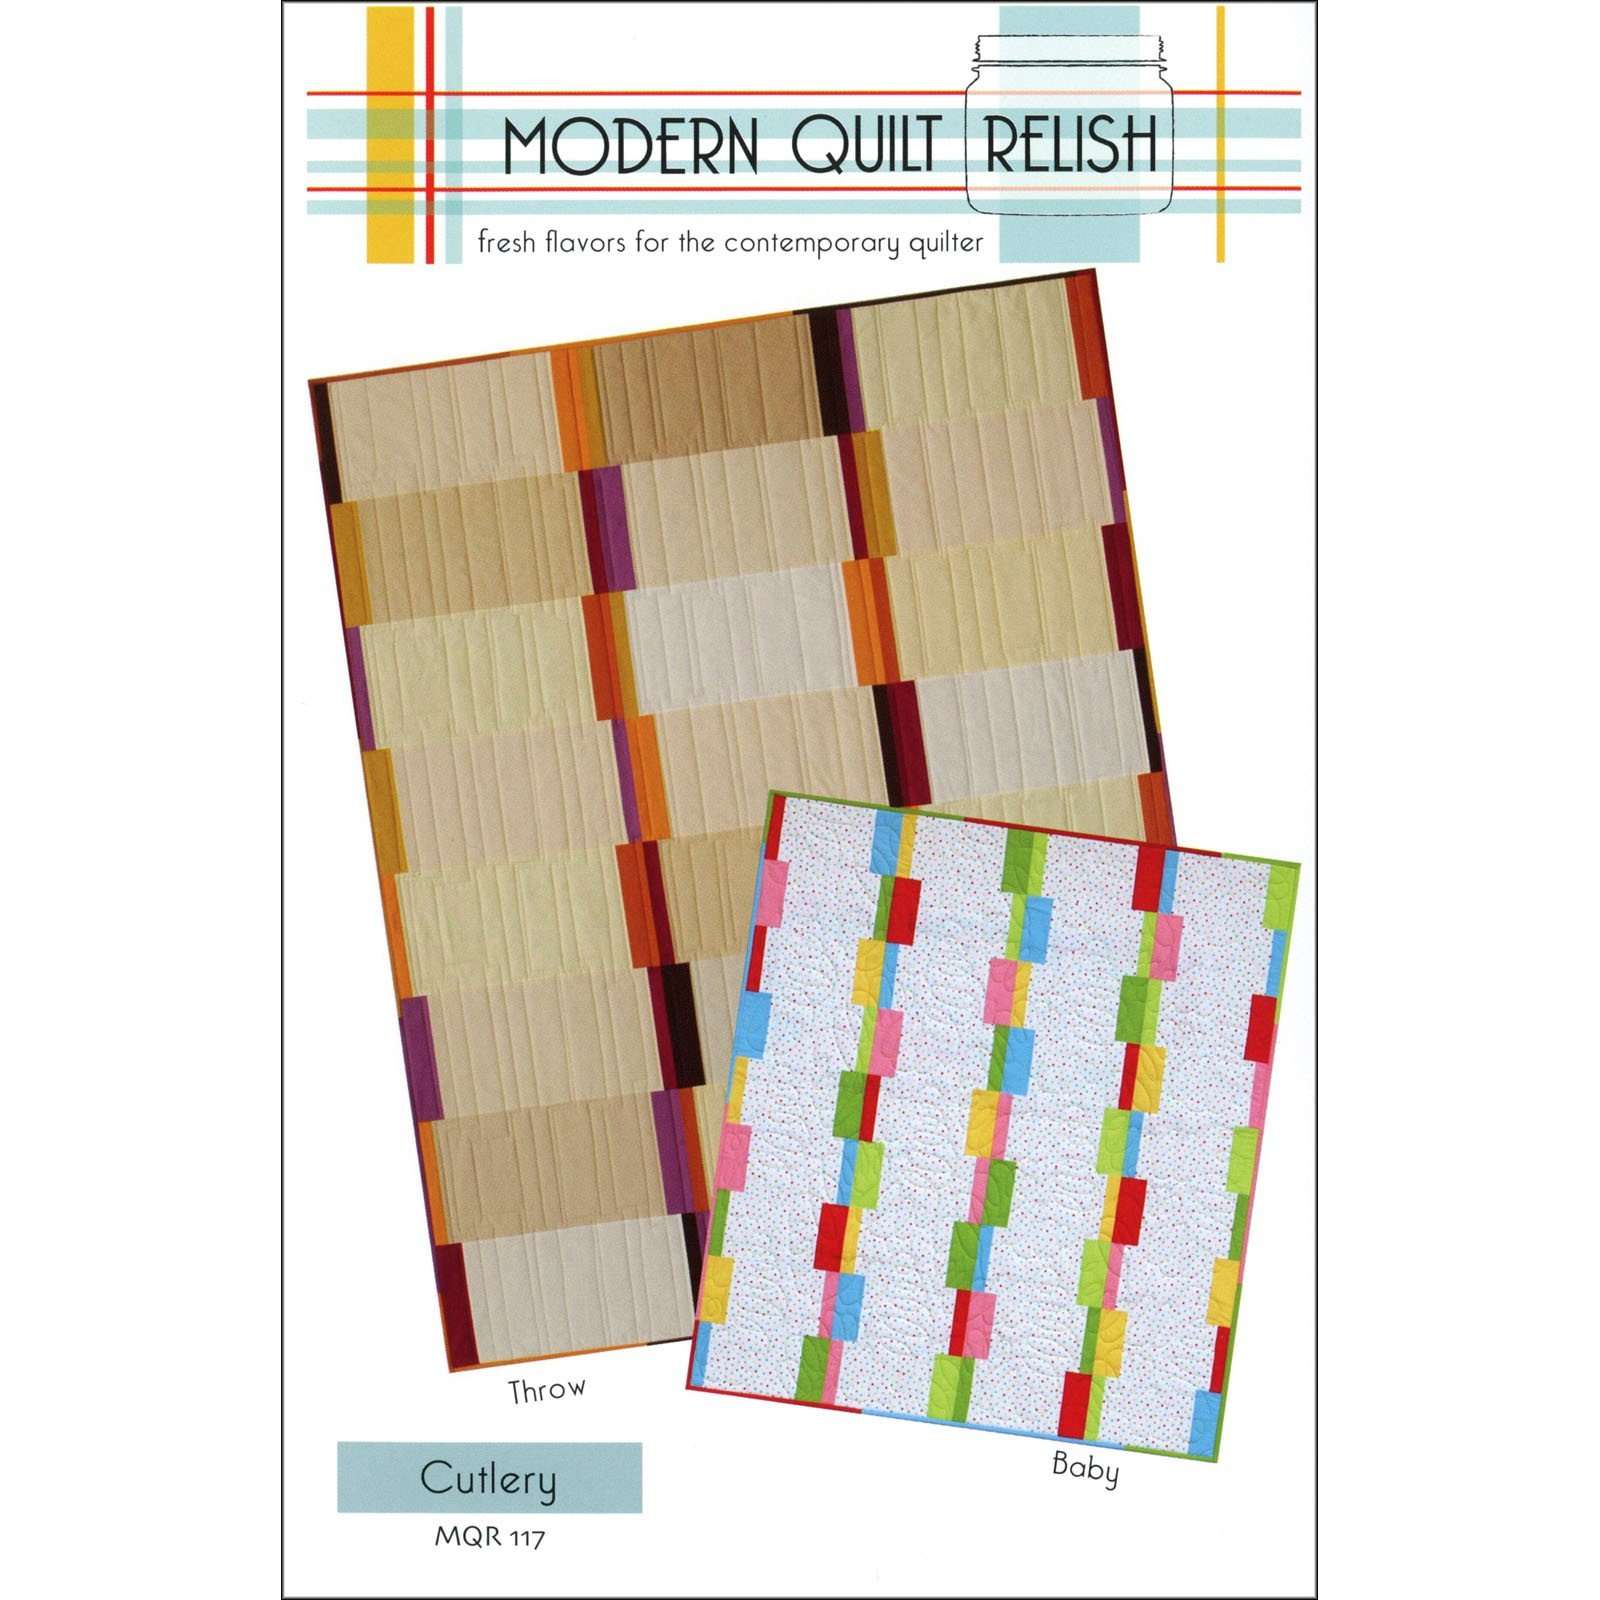 Cutlery<br/>Modern Quilt Relish